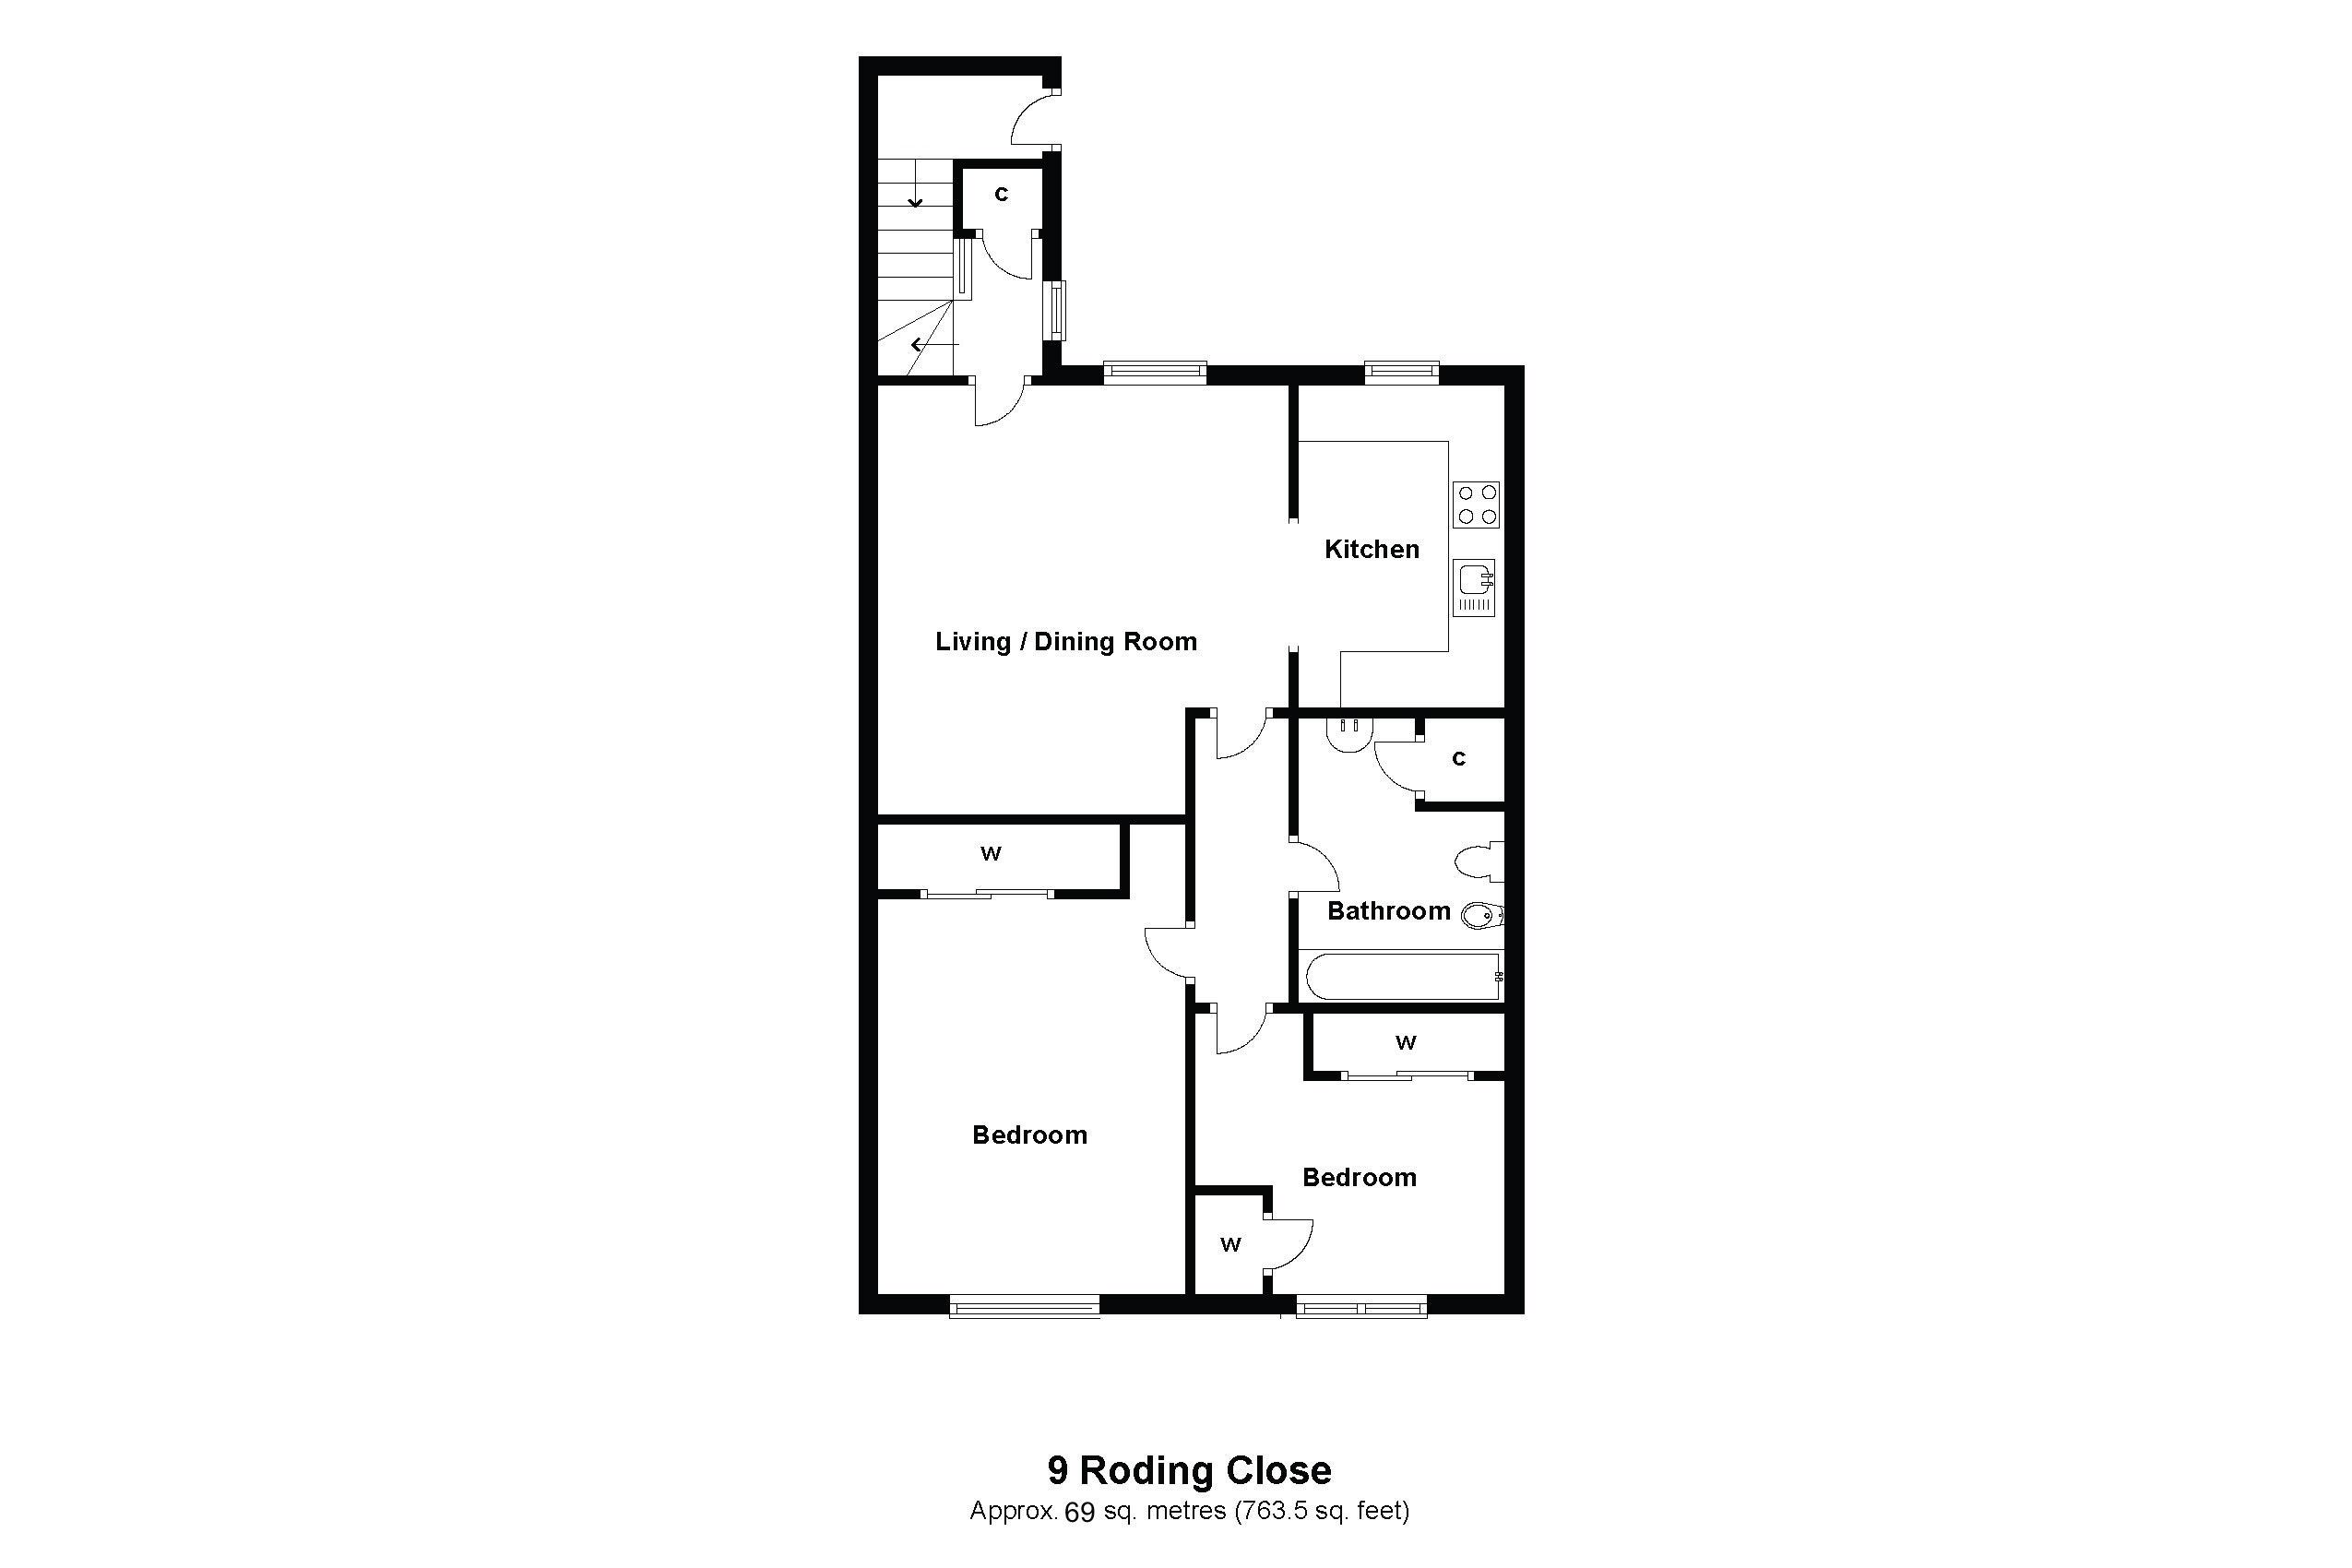 9 Roding Close Floorplan